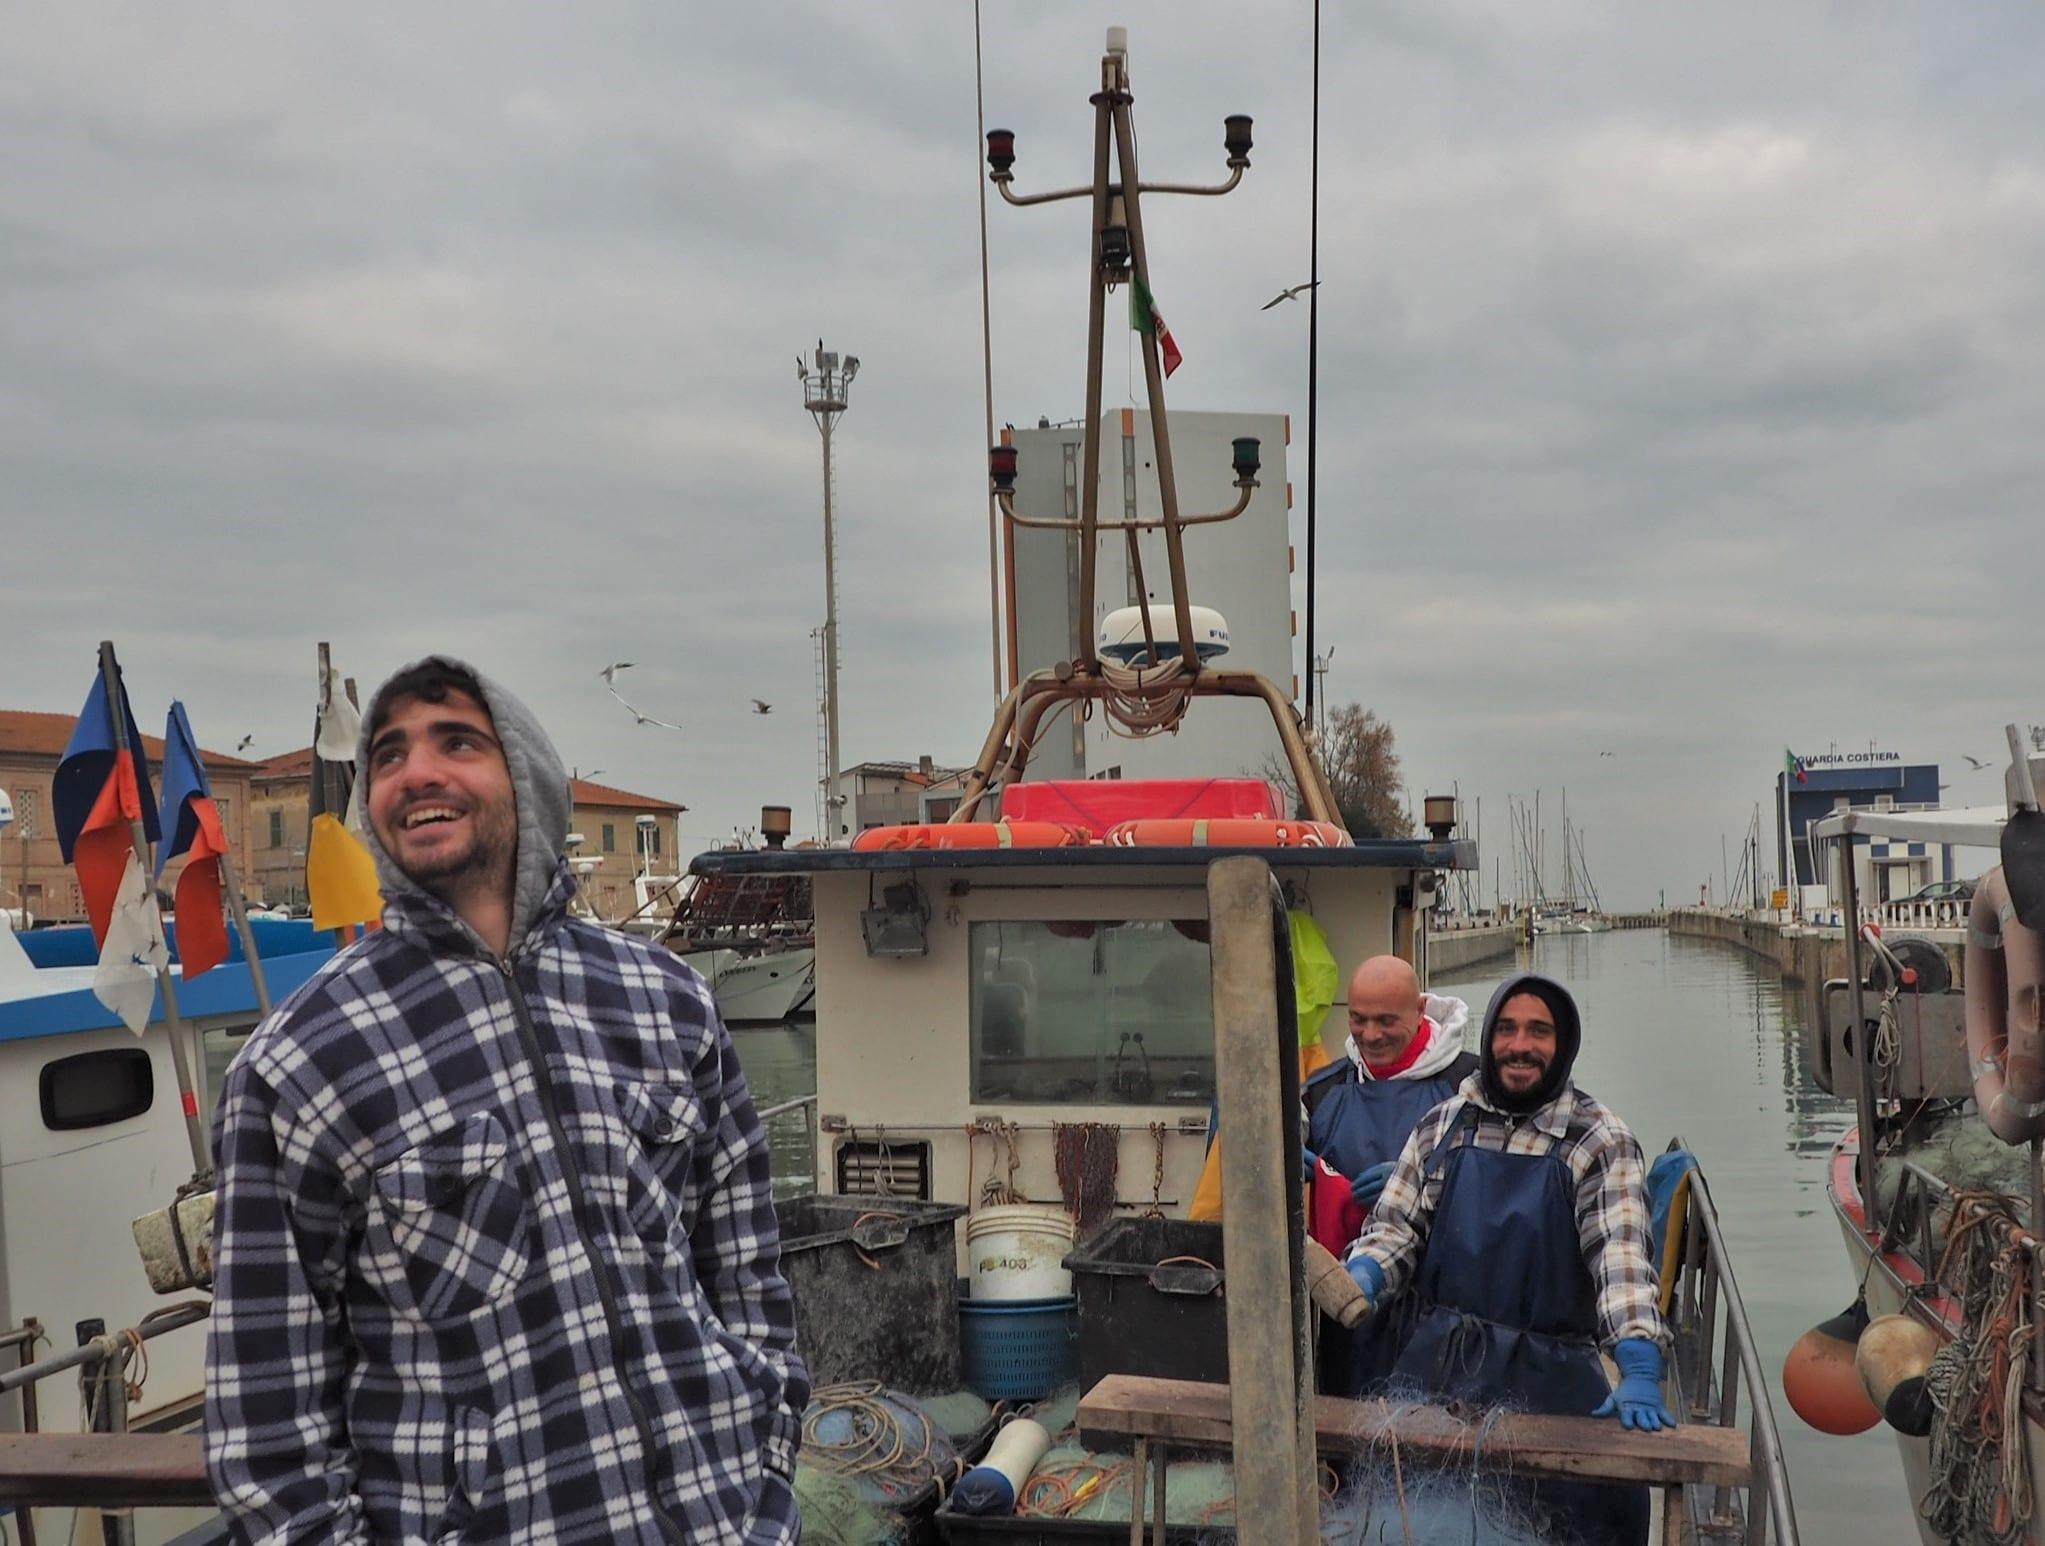 Uliassi pescatori